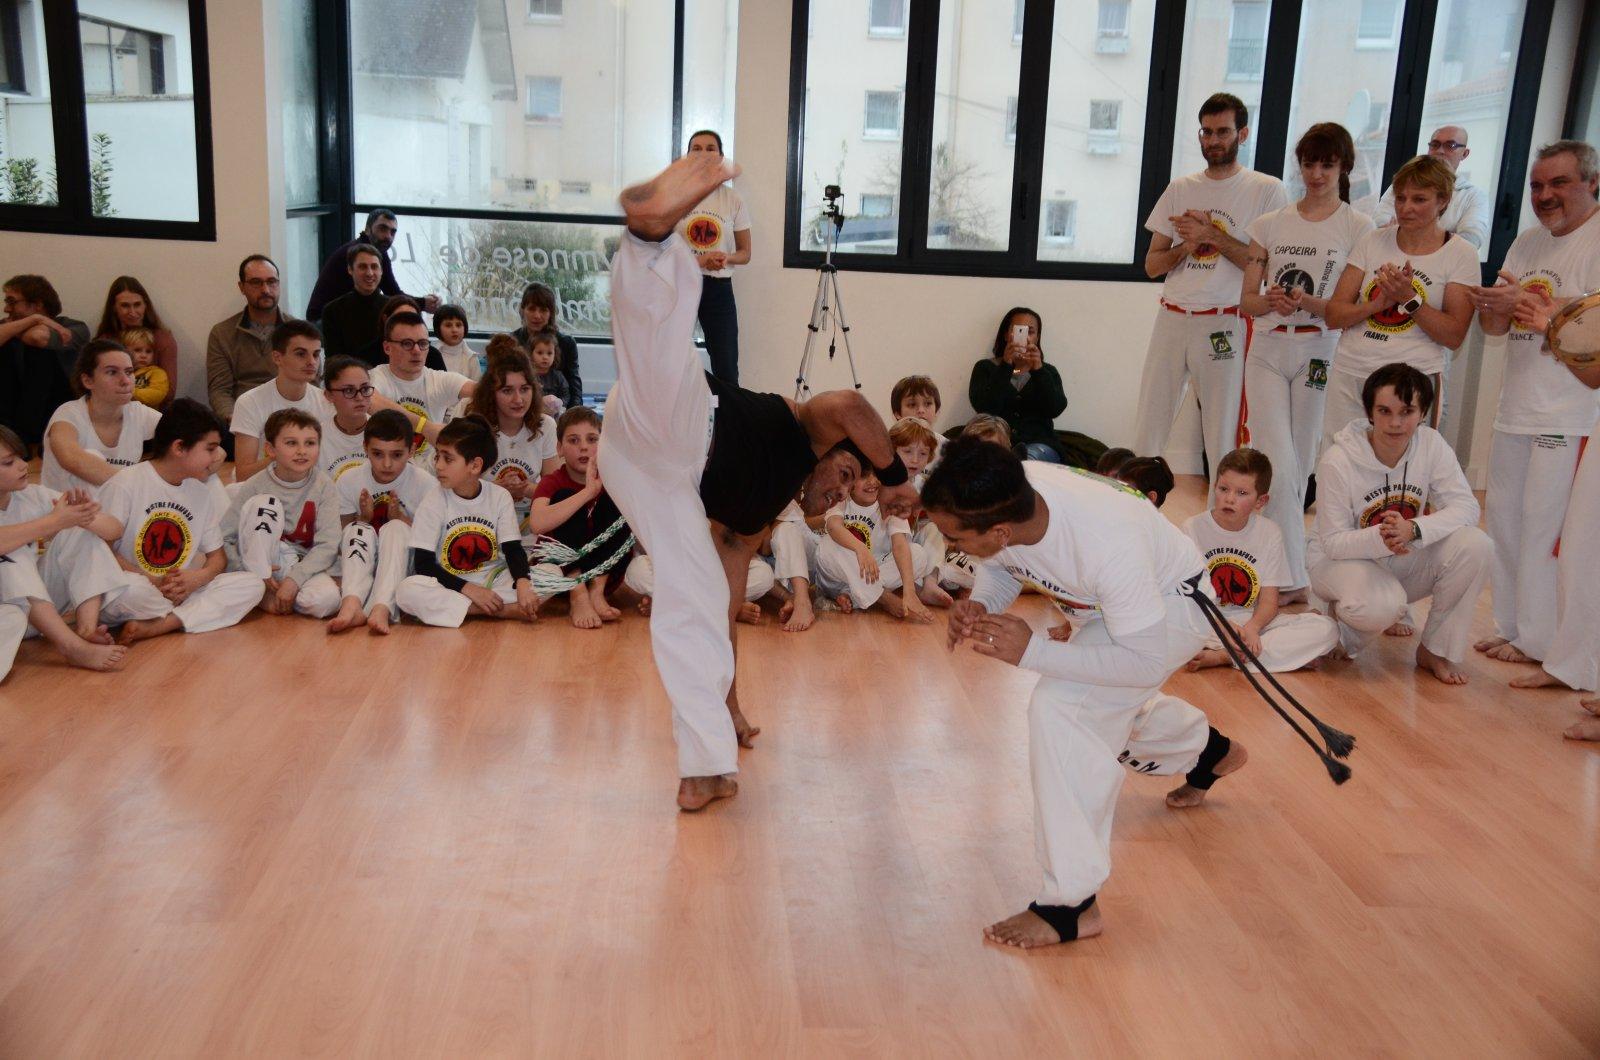 Roda E Galette 2018 Capoeira Nantes (70)